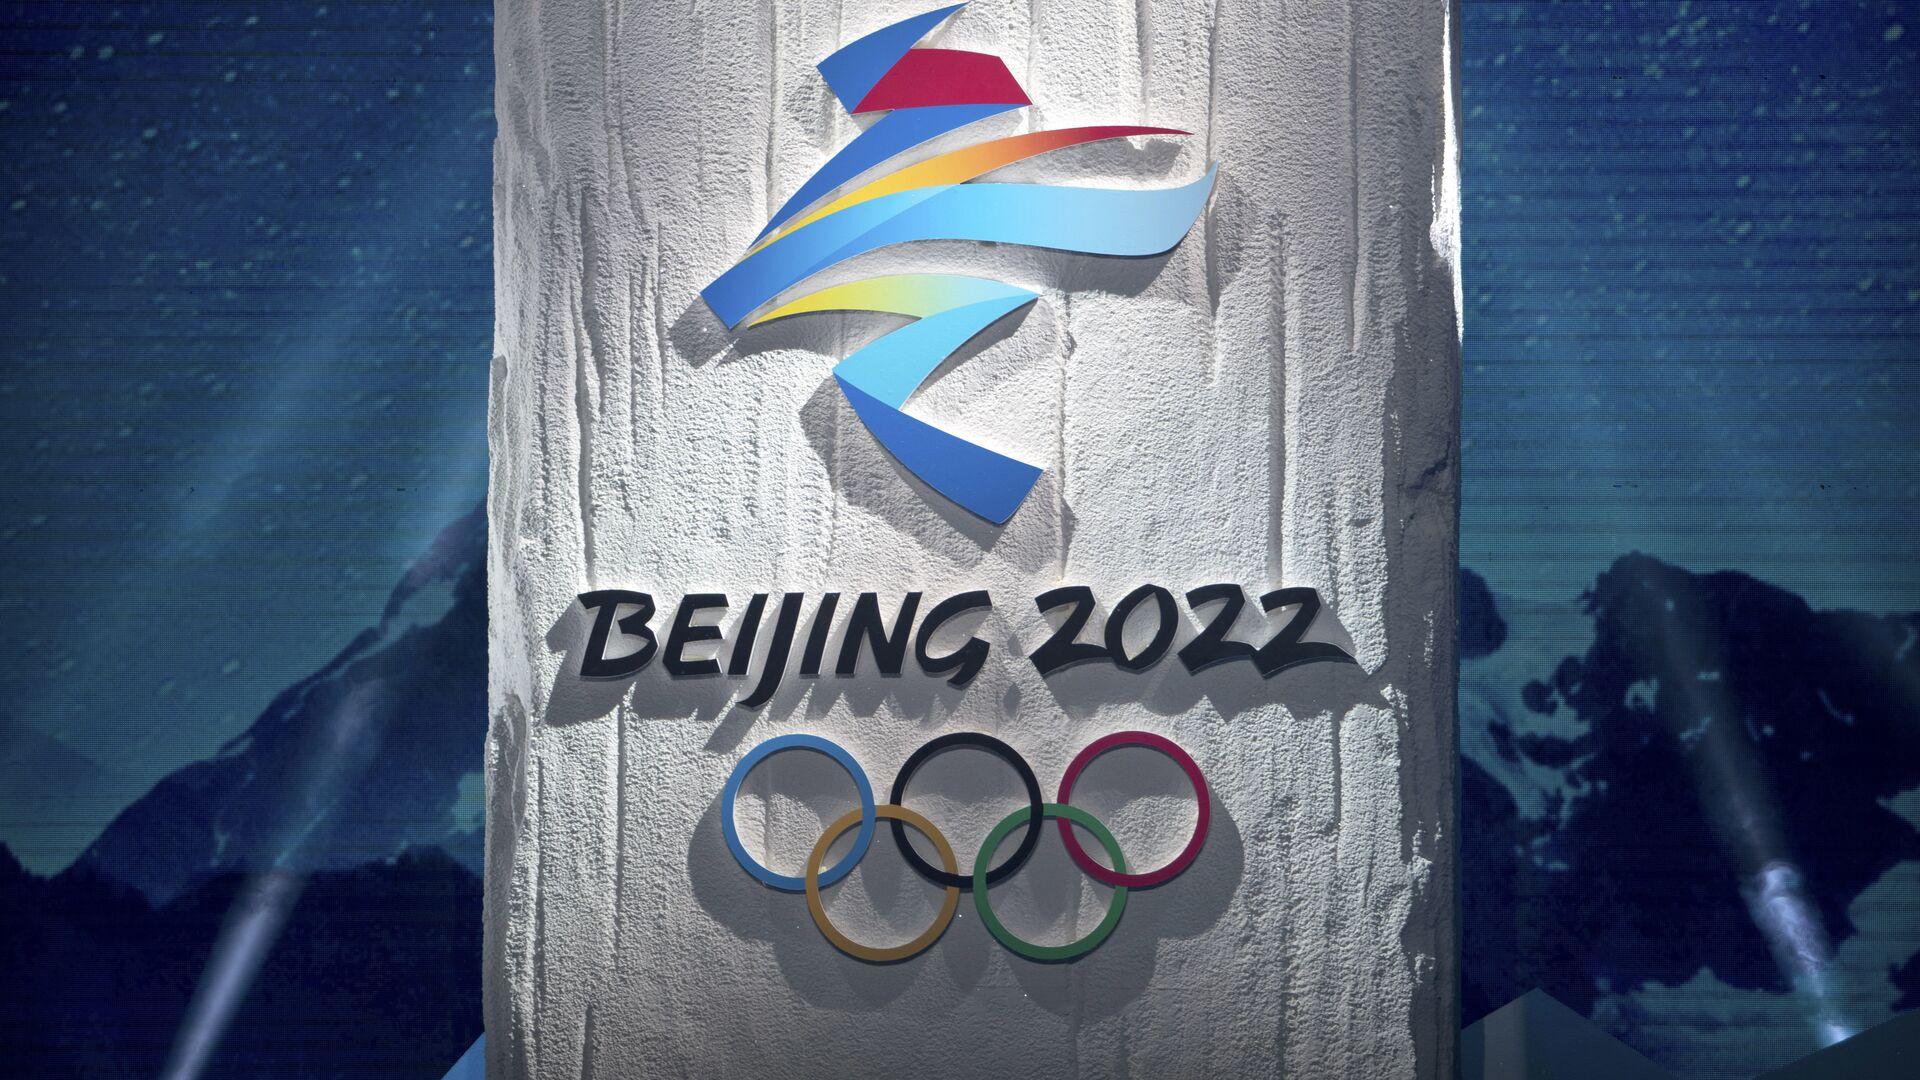 Logo de JJOO 2022 en Pekín - Sputnik Mundo, 1920, 04.06.2021